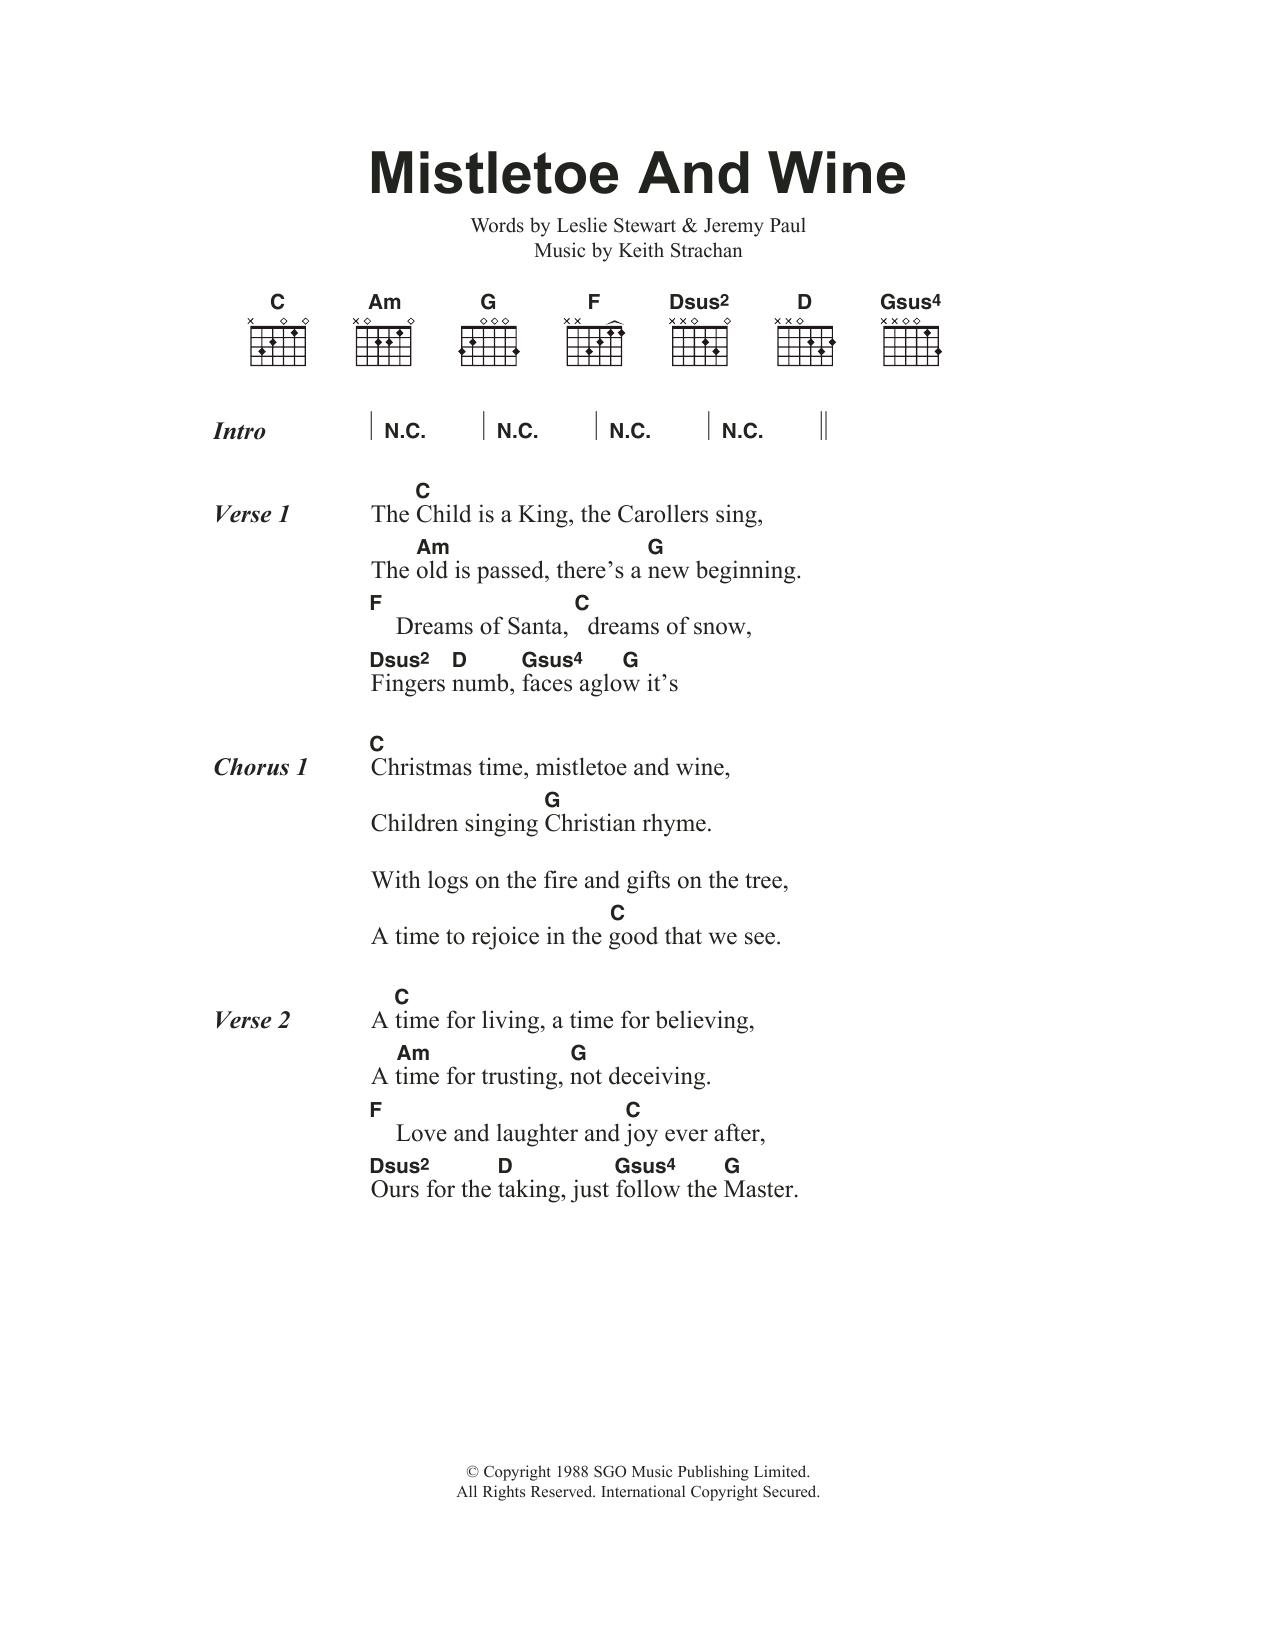 Mistletoe And Wine Sheet Music Cliff Richard Lyrics Chords